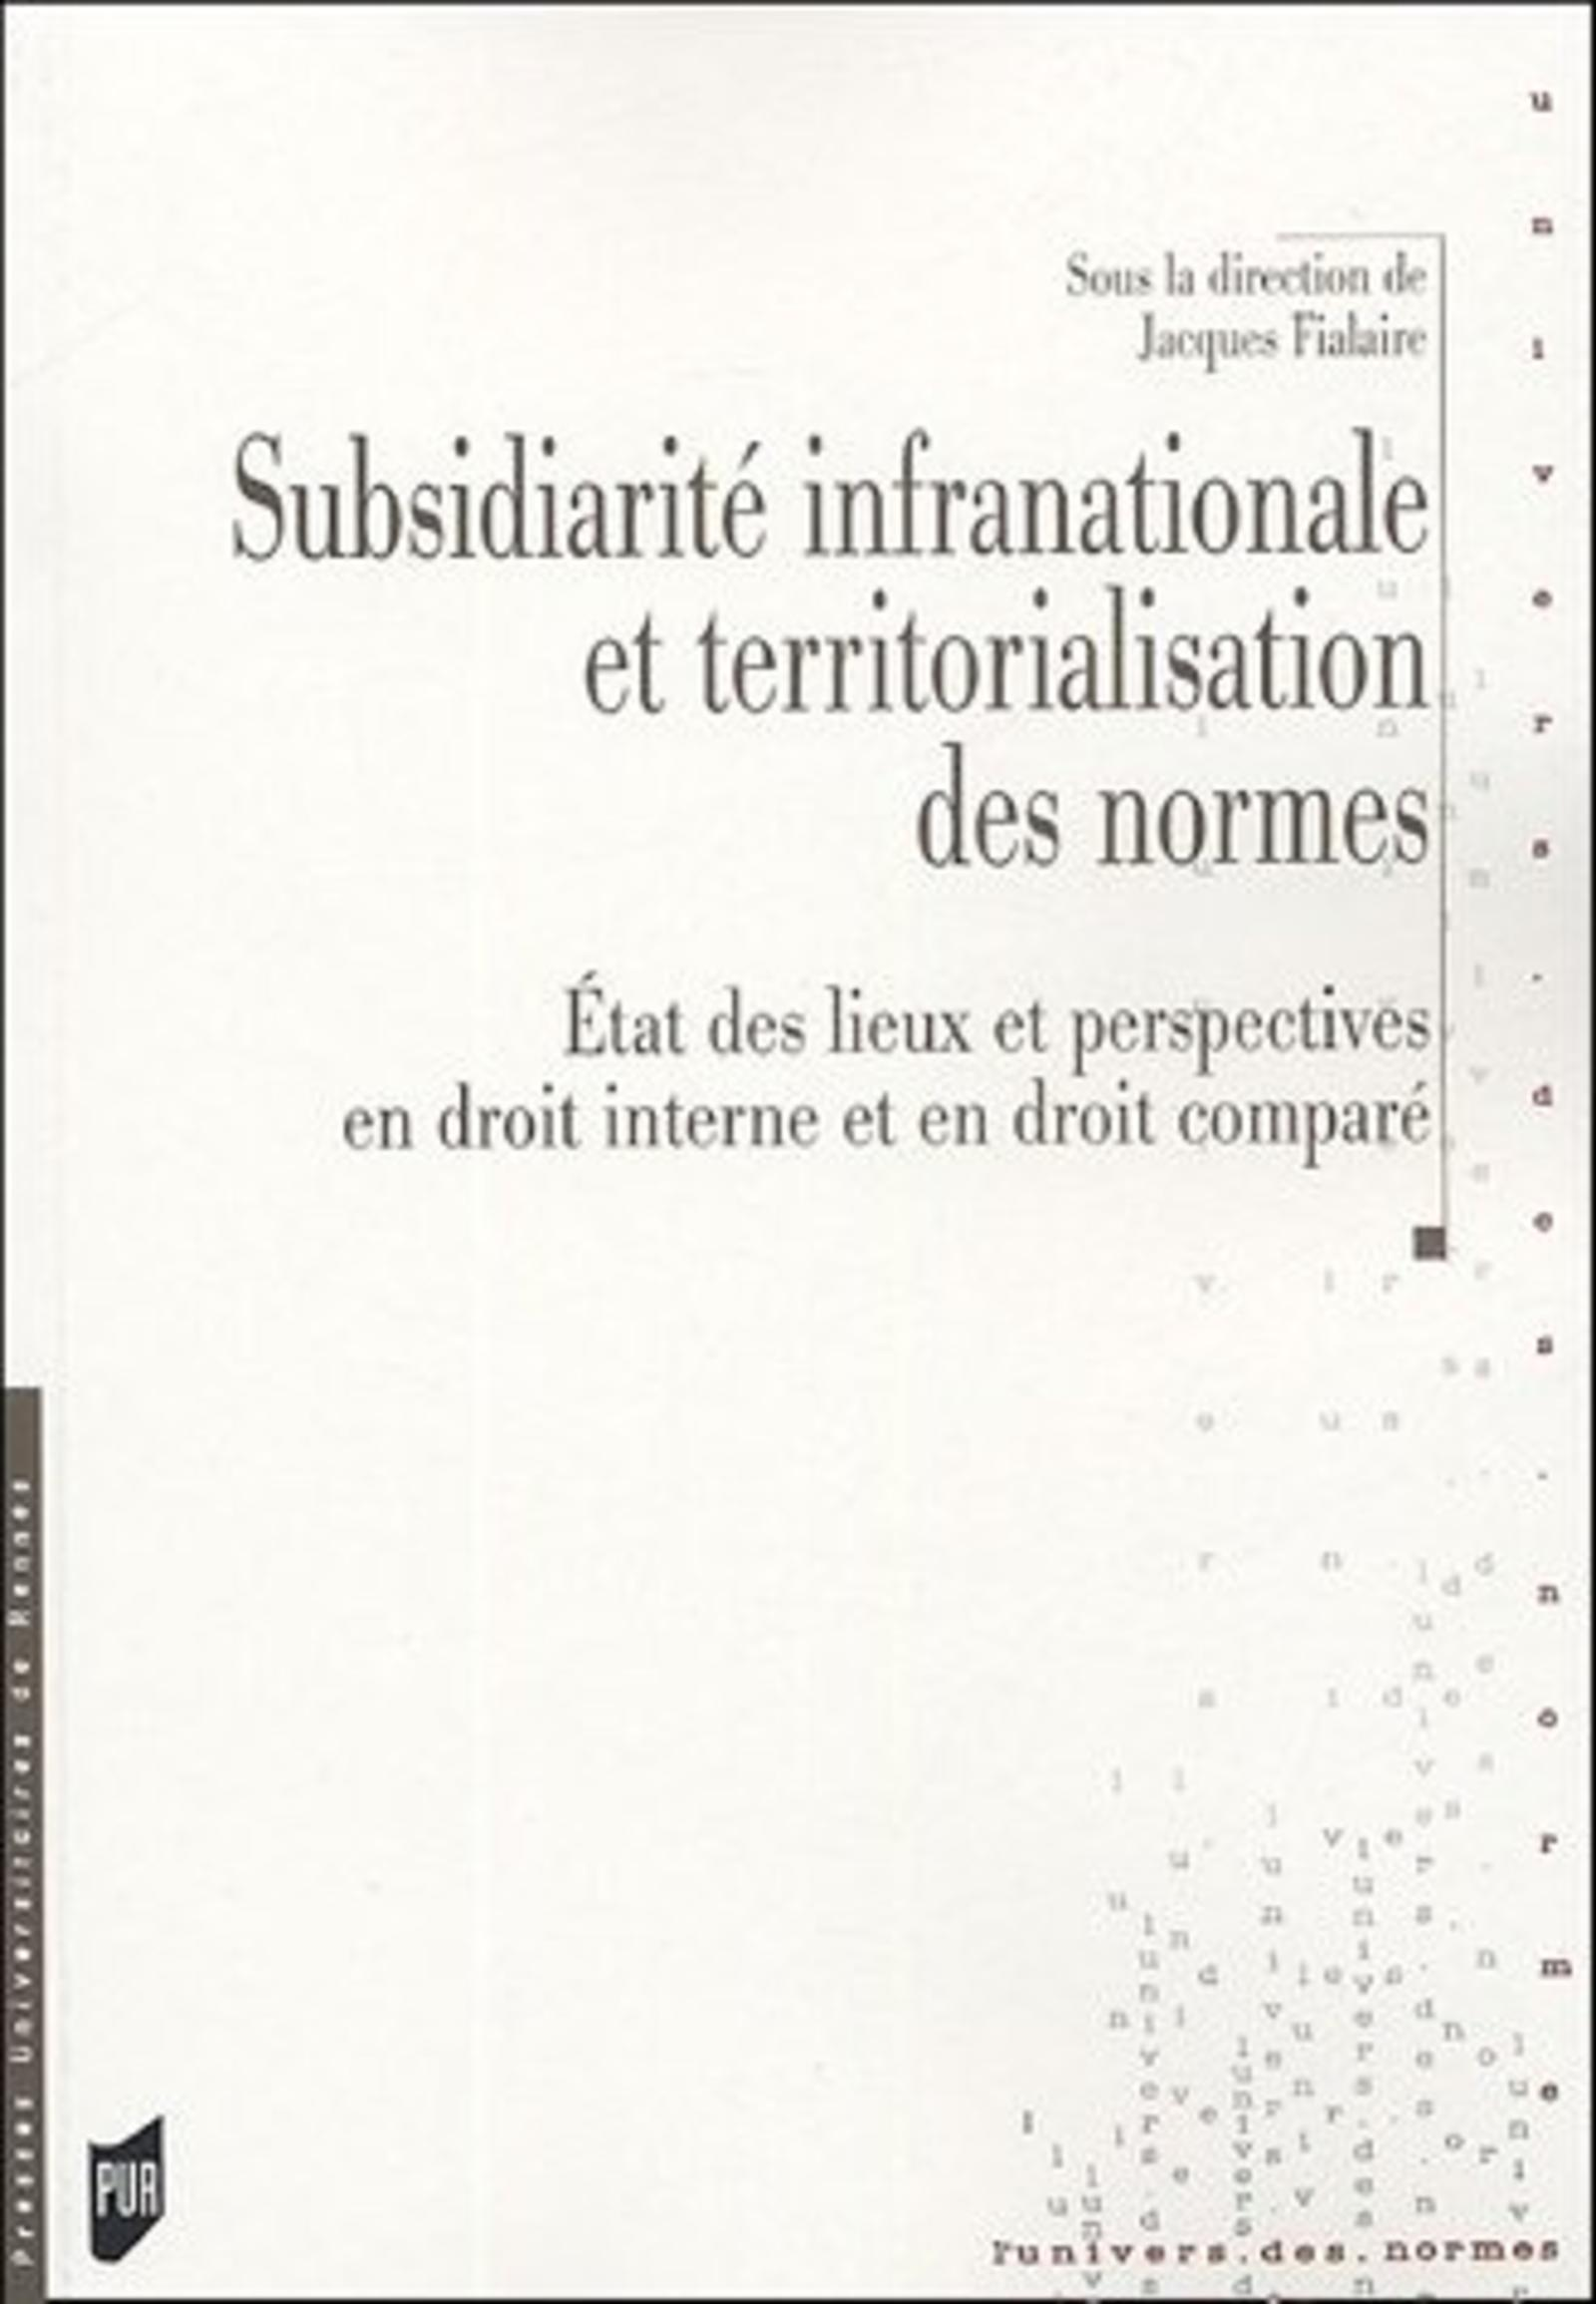 SUBSIDIARITE INTERNATIONALE ET TERRITORIALISATION DES NORMES